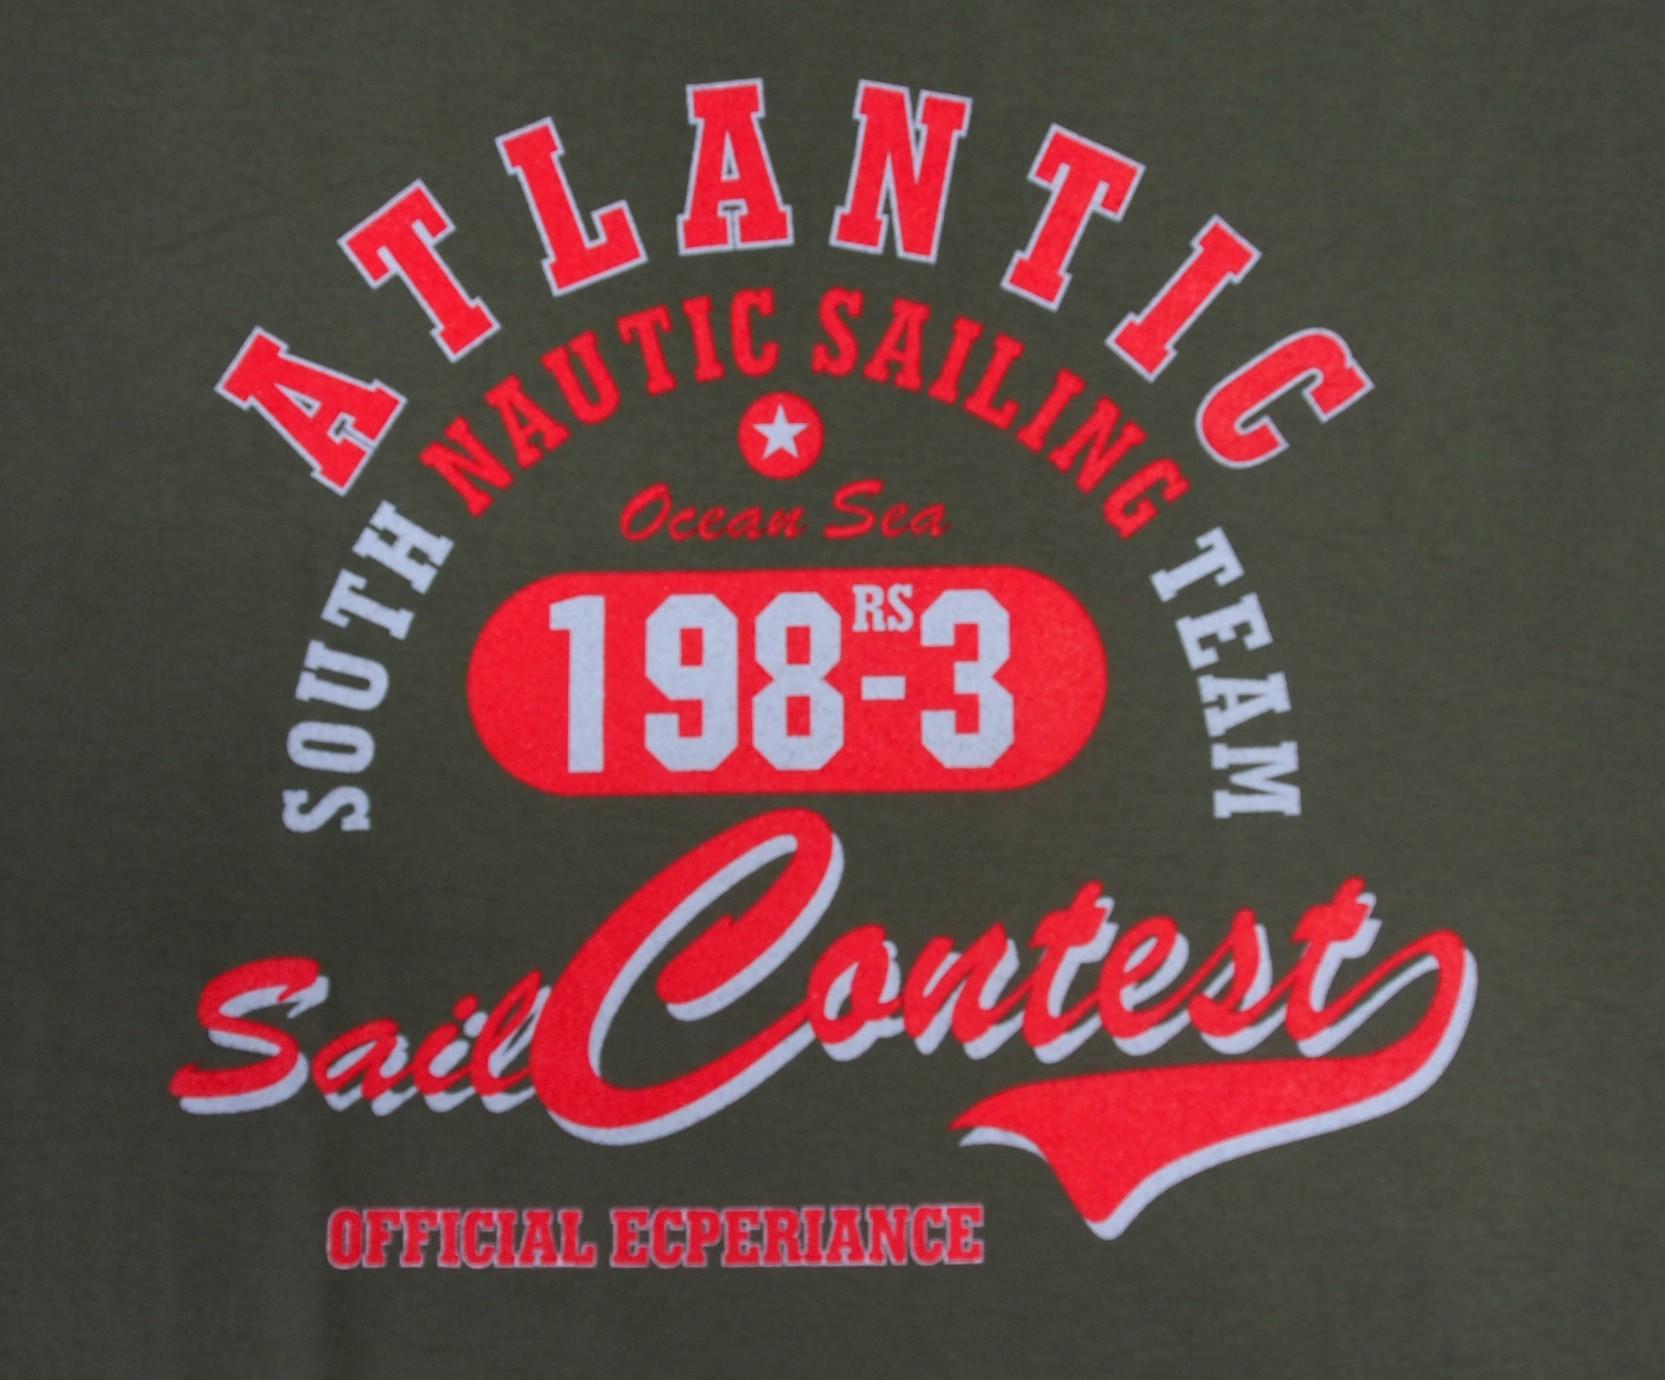 Atlantic - Tmavě šedá s červenou